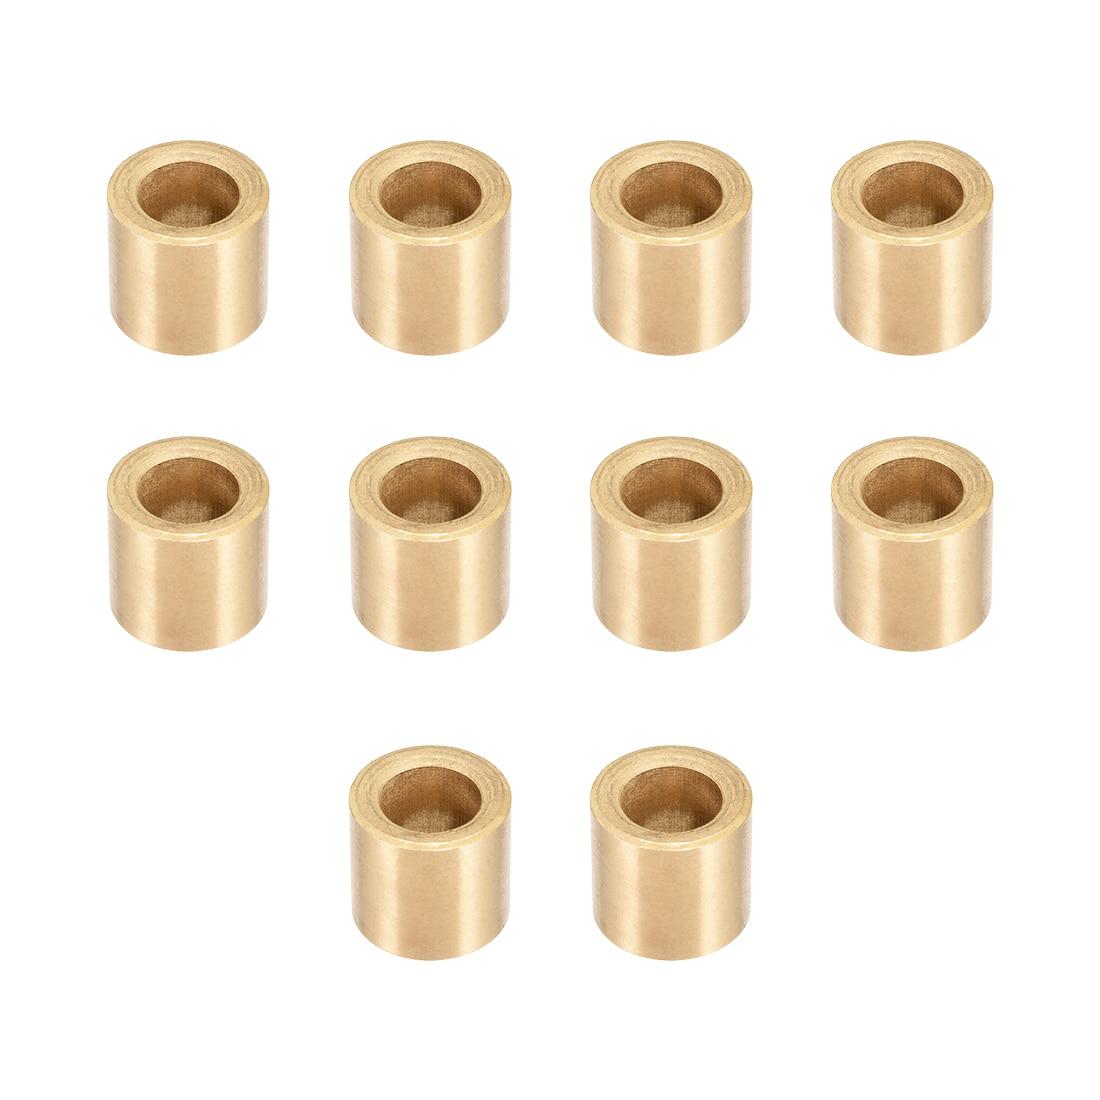 Uxcell Self-Lubricating Bearing Sleeve 12mm 14mm ID 18mm 20mm OD Sintered Bronze Bearing Bushings Length 10/12/15/20/22/25mm